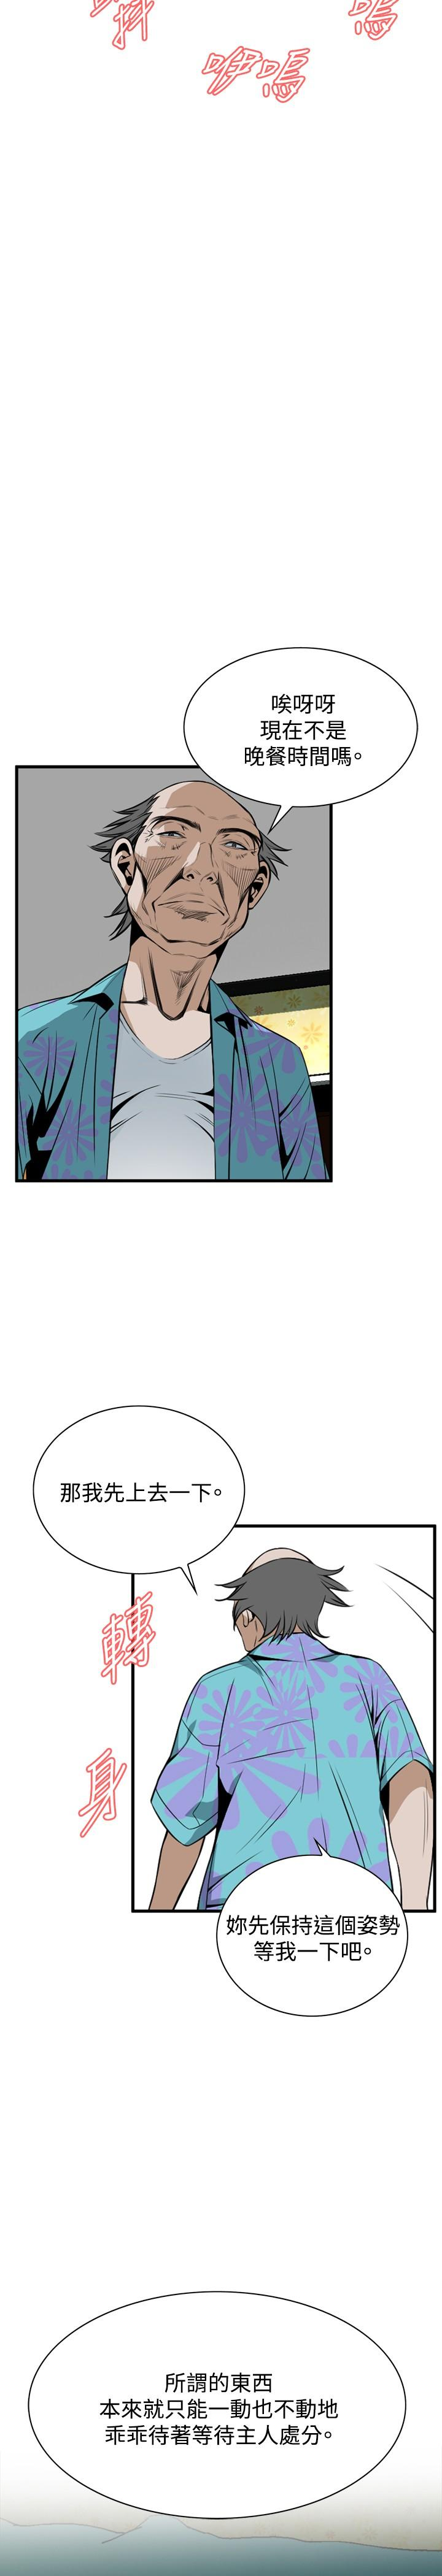 Take a Peek 偷窥 Ch.39~60 [Chinese]中文 135